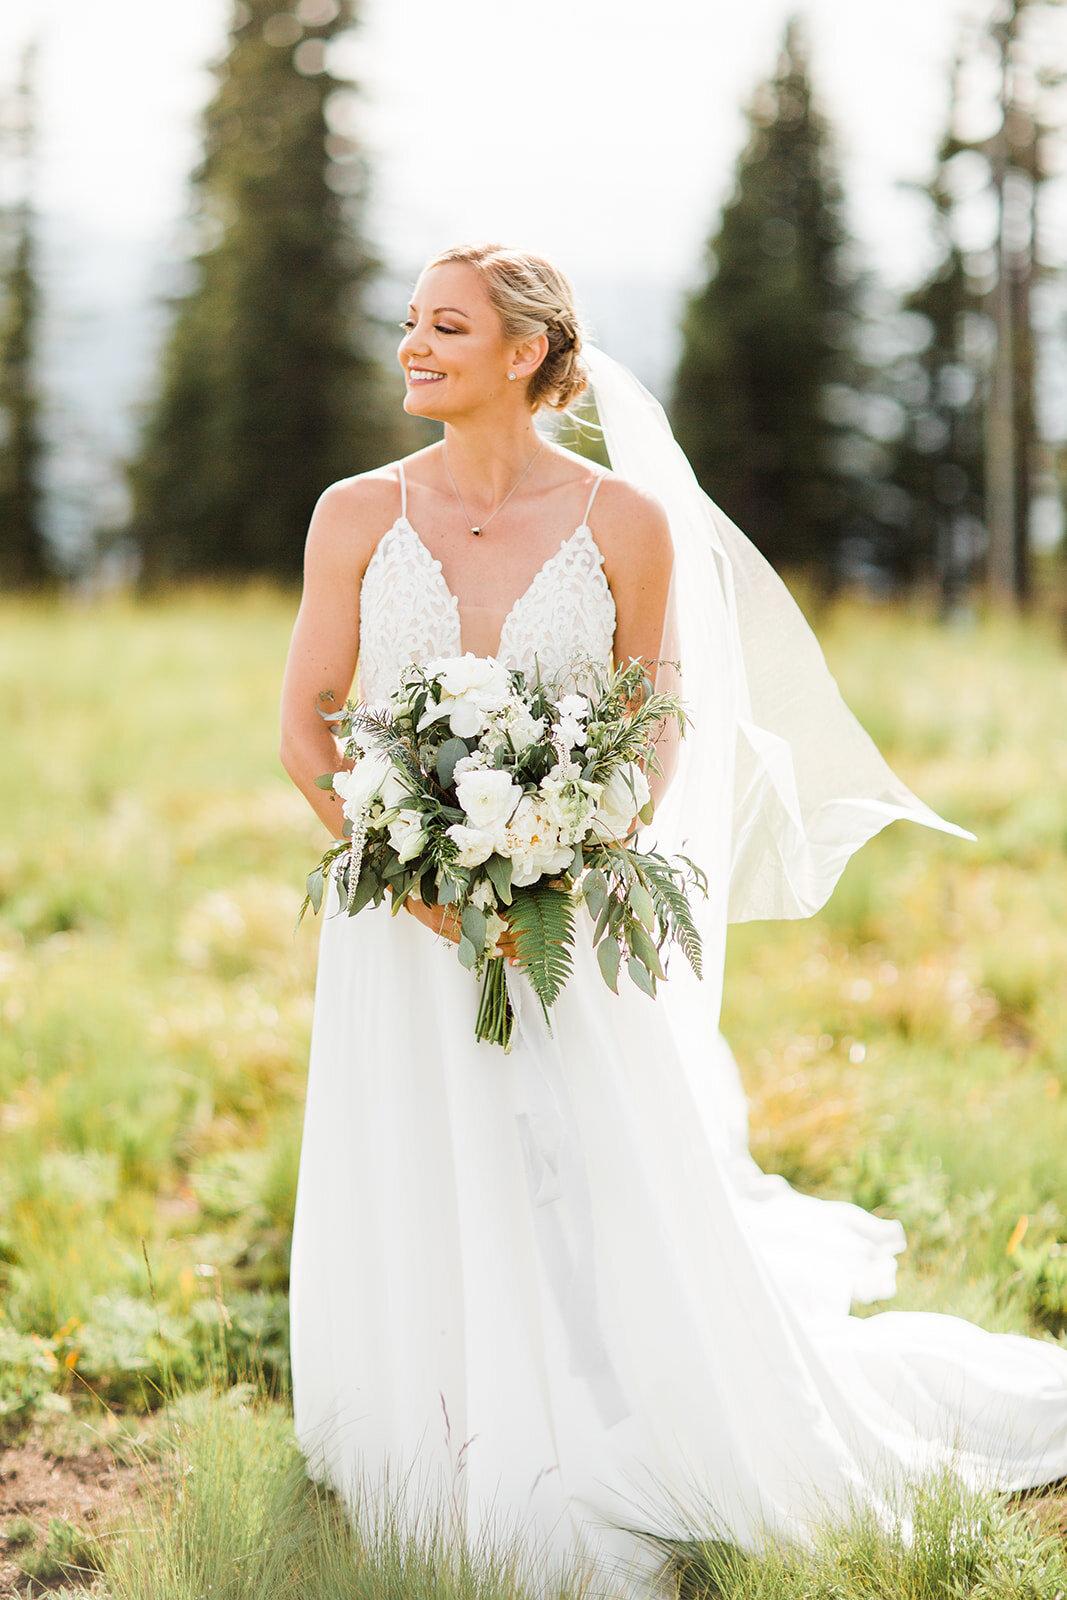 spokane bride portraits wedding